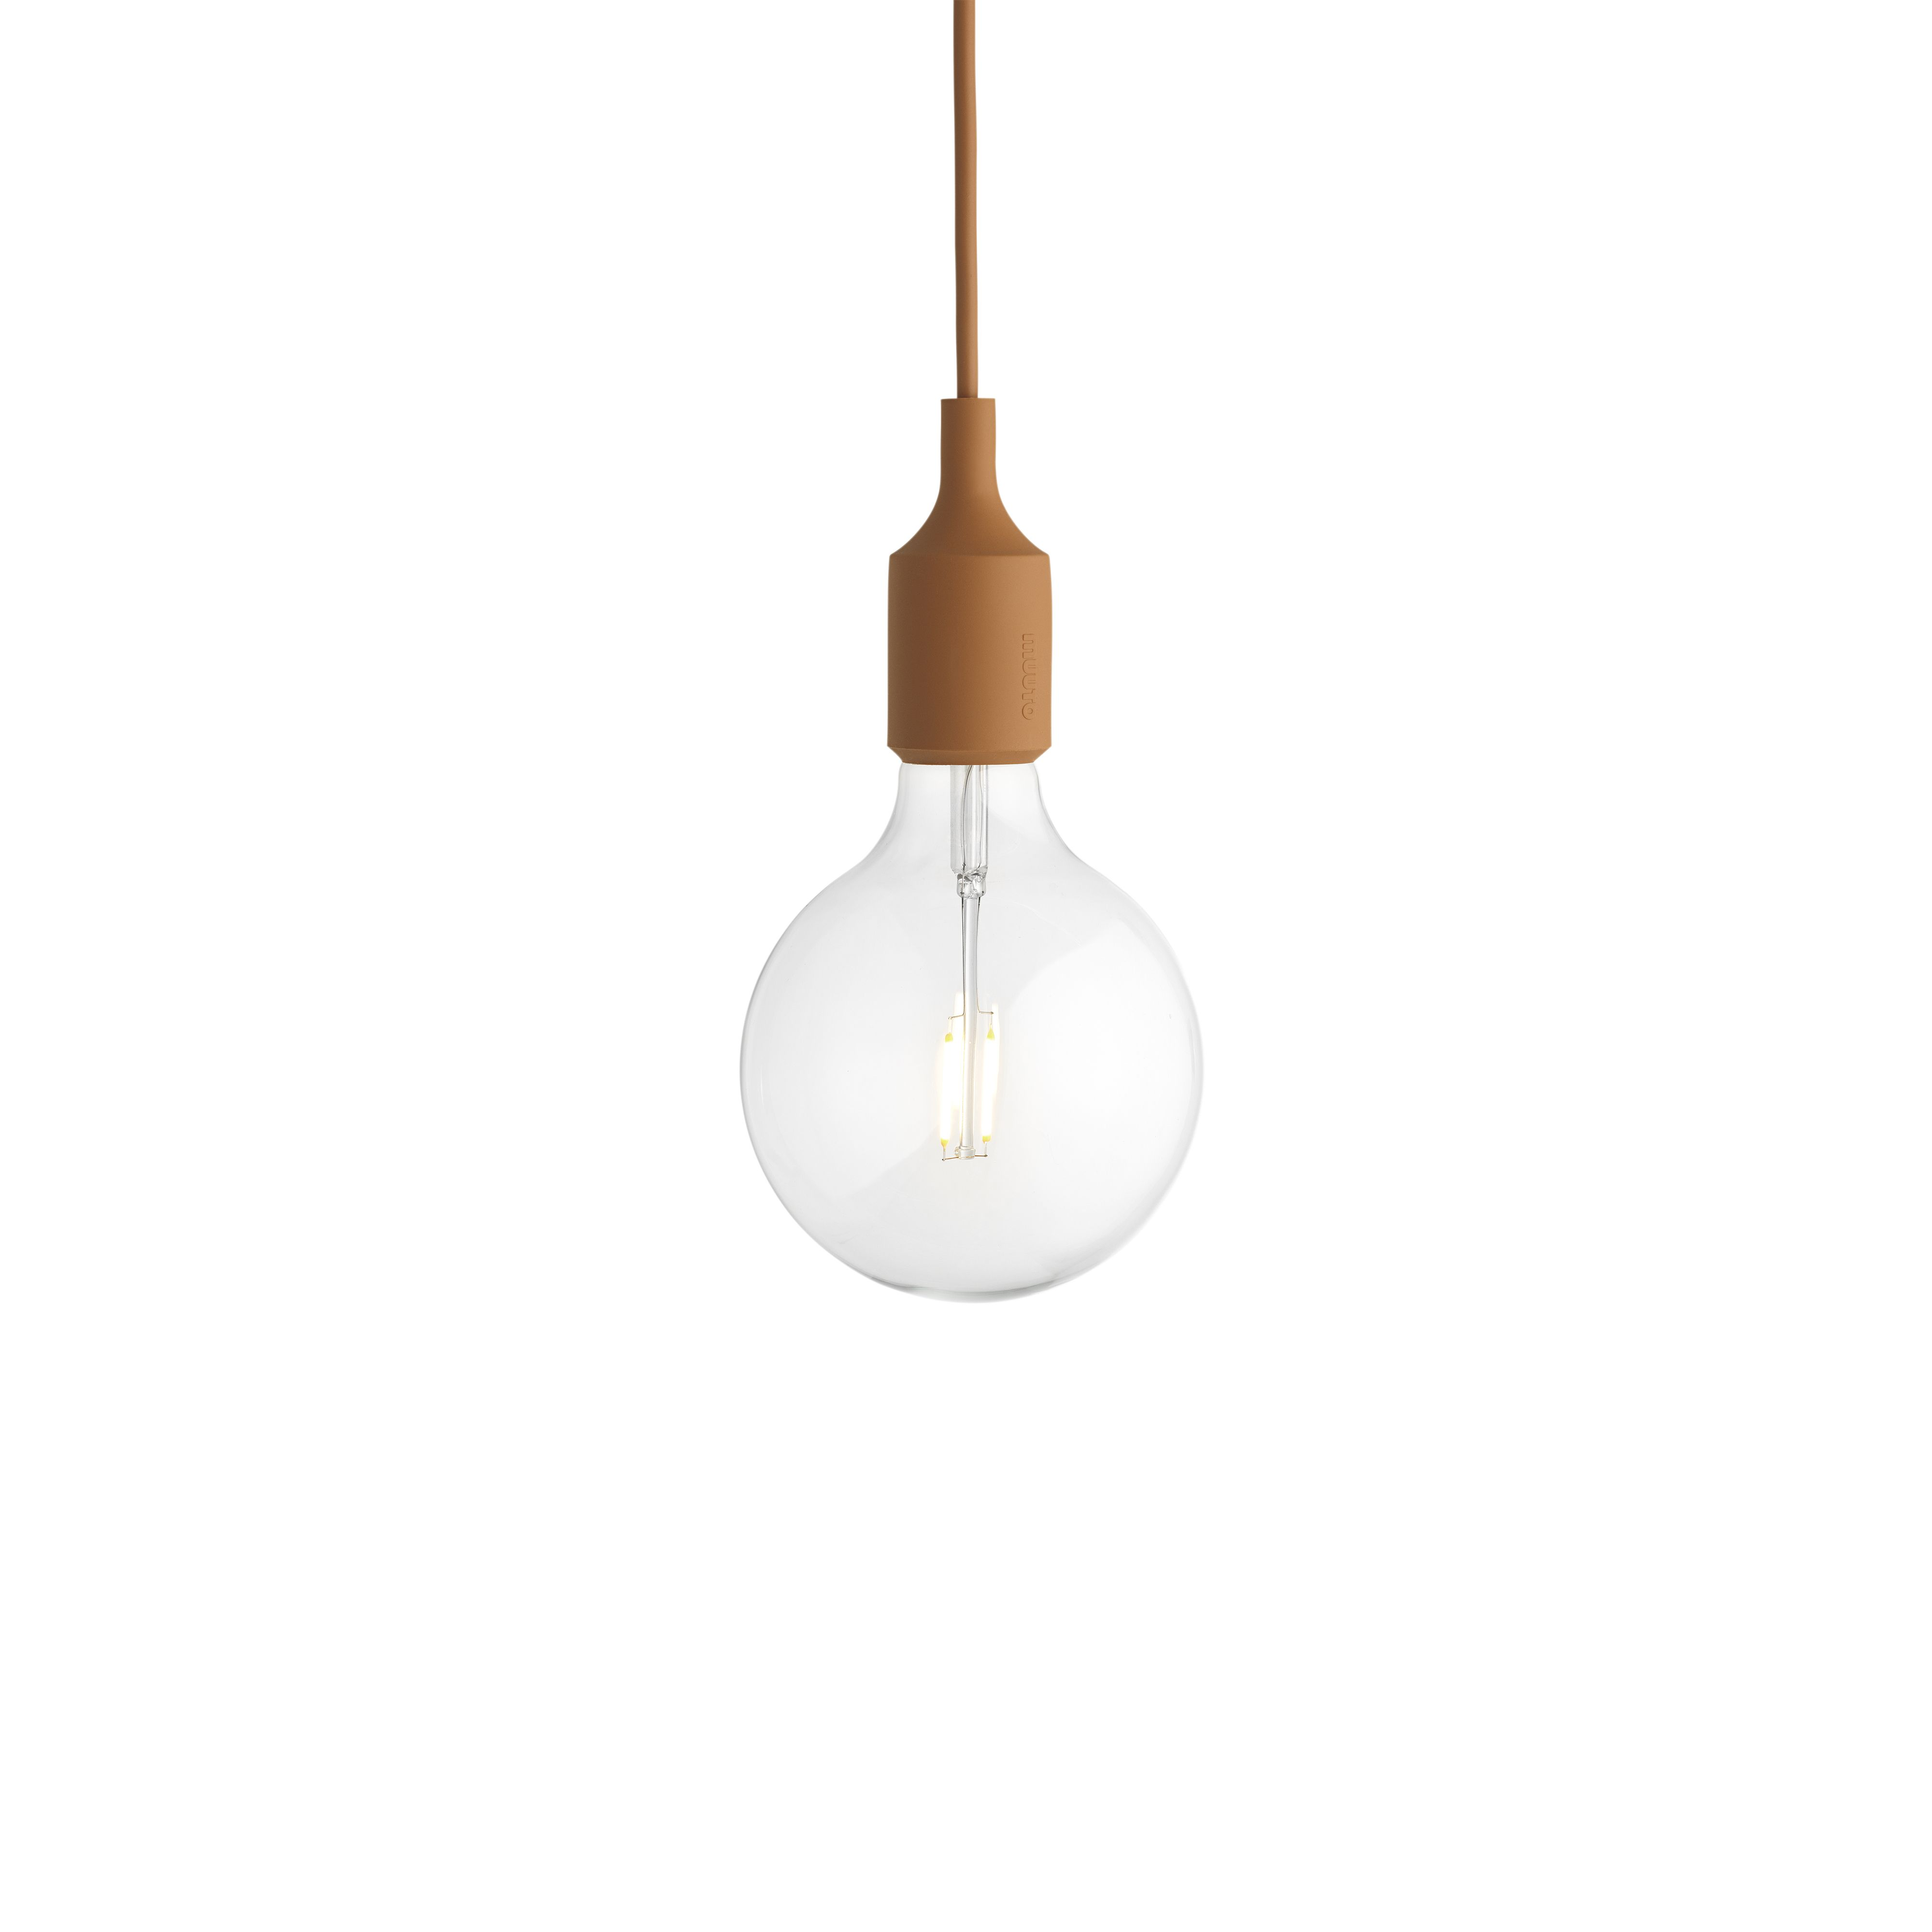 E27 Pendant Lamp In Clay Brown Designed By Mattias Stahlbom For Muuto Muuto Newperspectives Scand Hanging Pendant Lamp Pendant Lamp Ceiling Pendant Lights